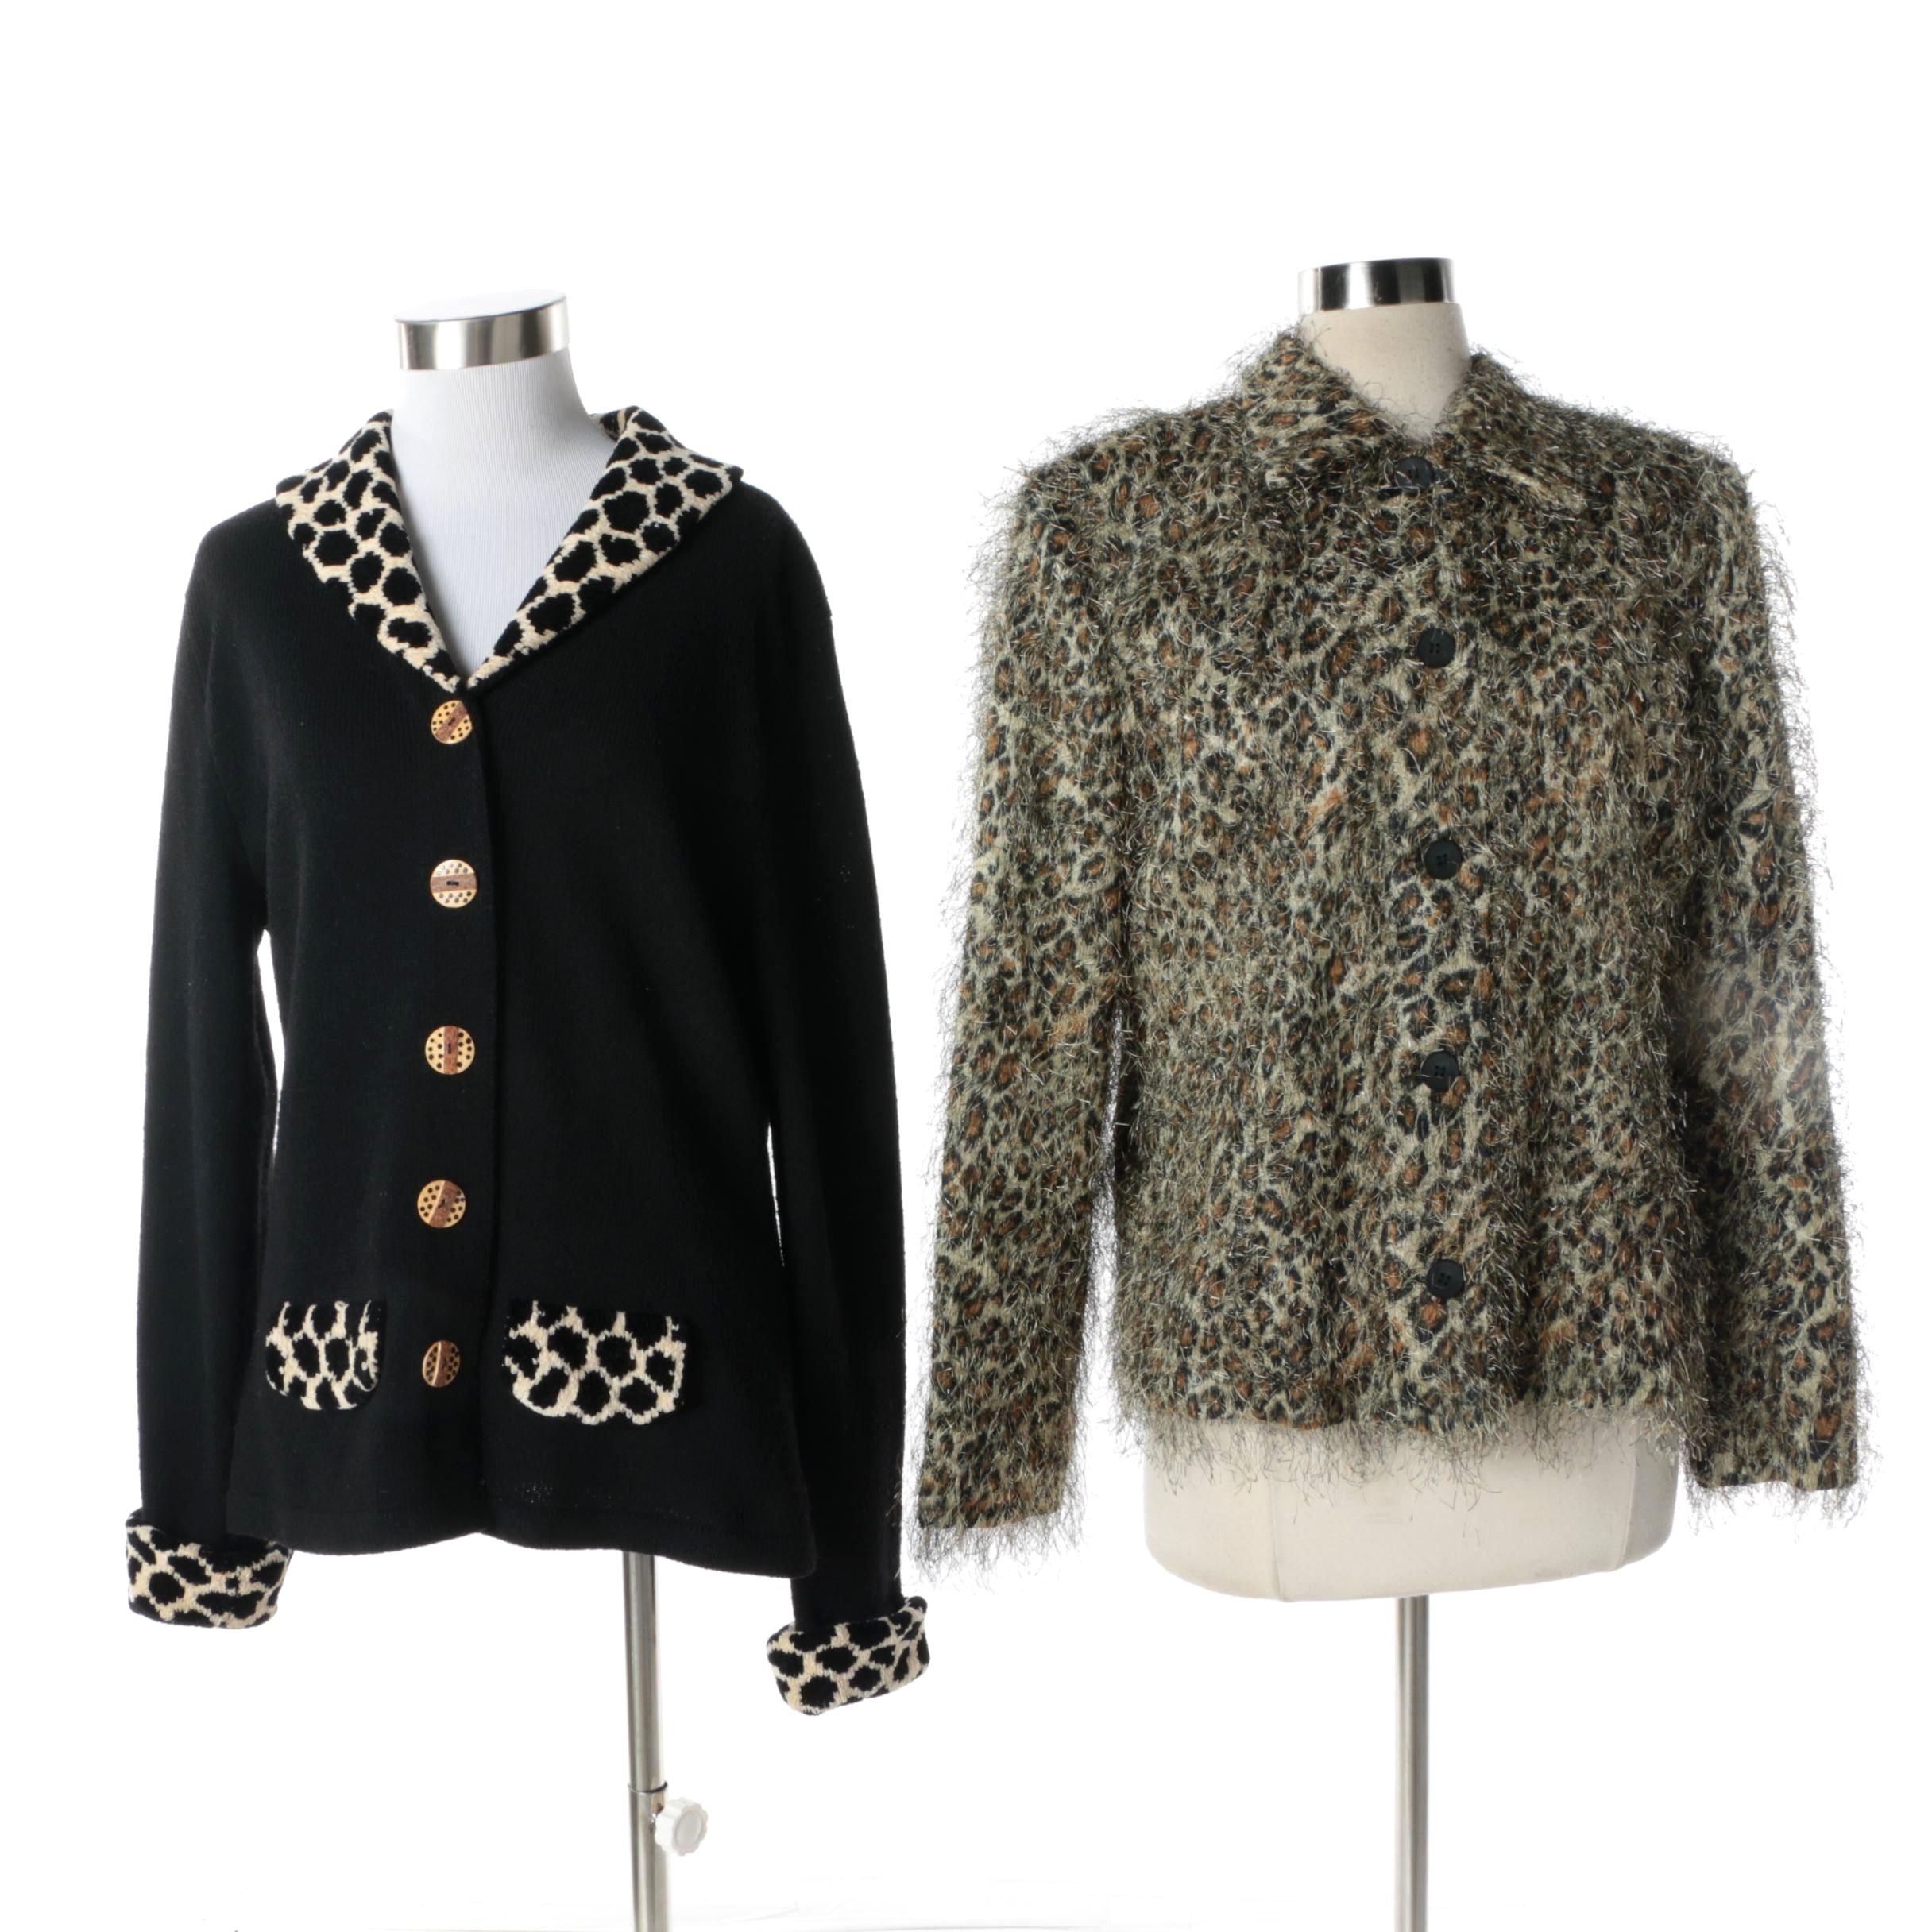 Women's Vintage Giancarlo Ferrari and Dia Animal Print Knit Jackets